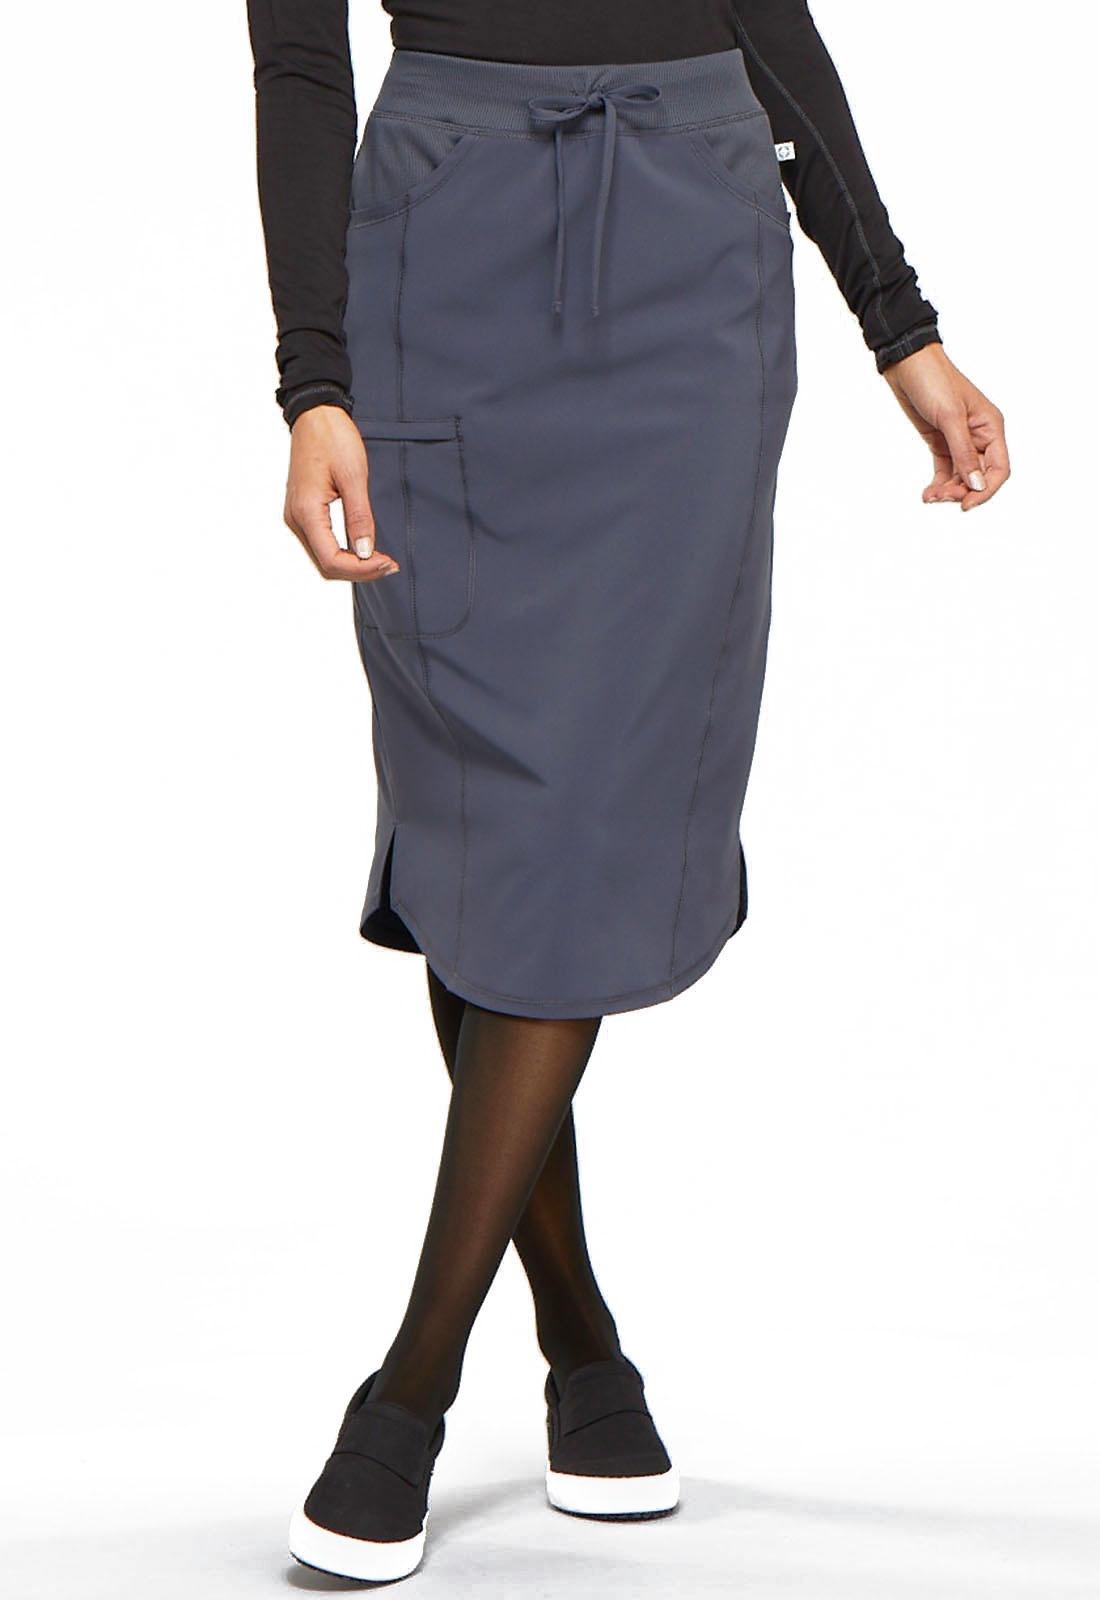 "CHEROKEE 30"" Drawstring Skirt Pewter Grey CK505A"